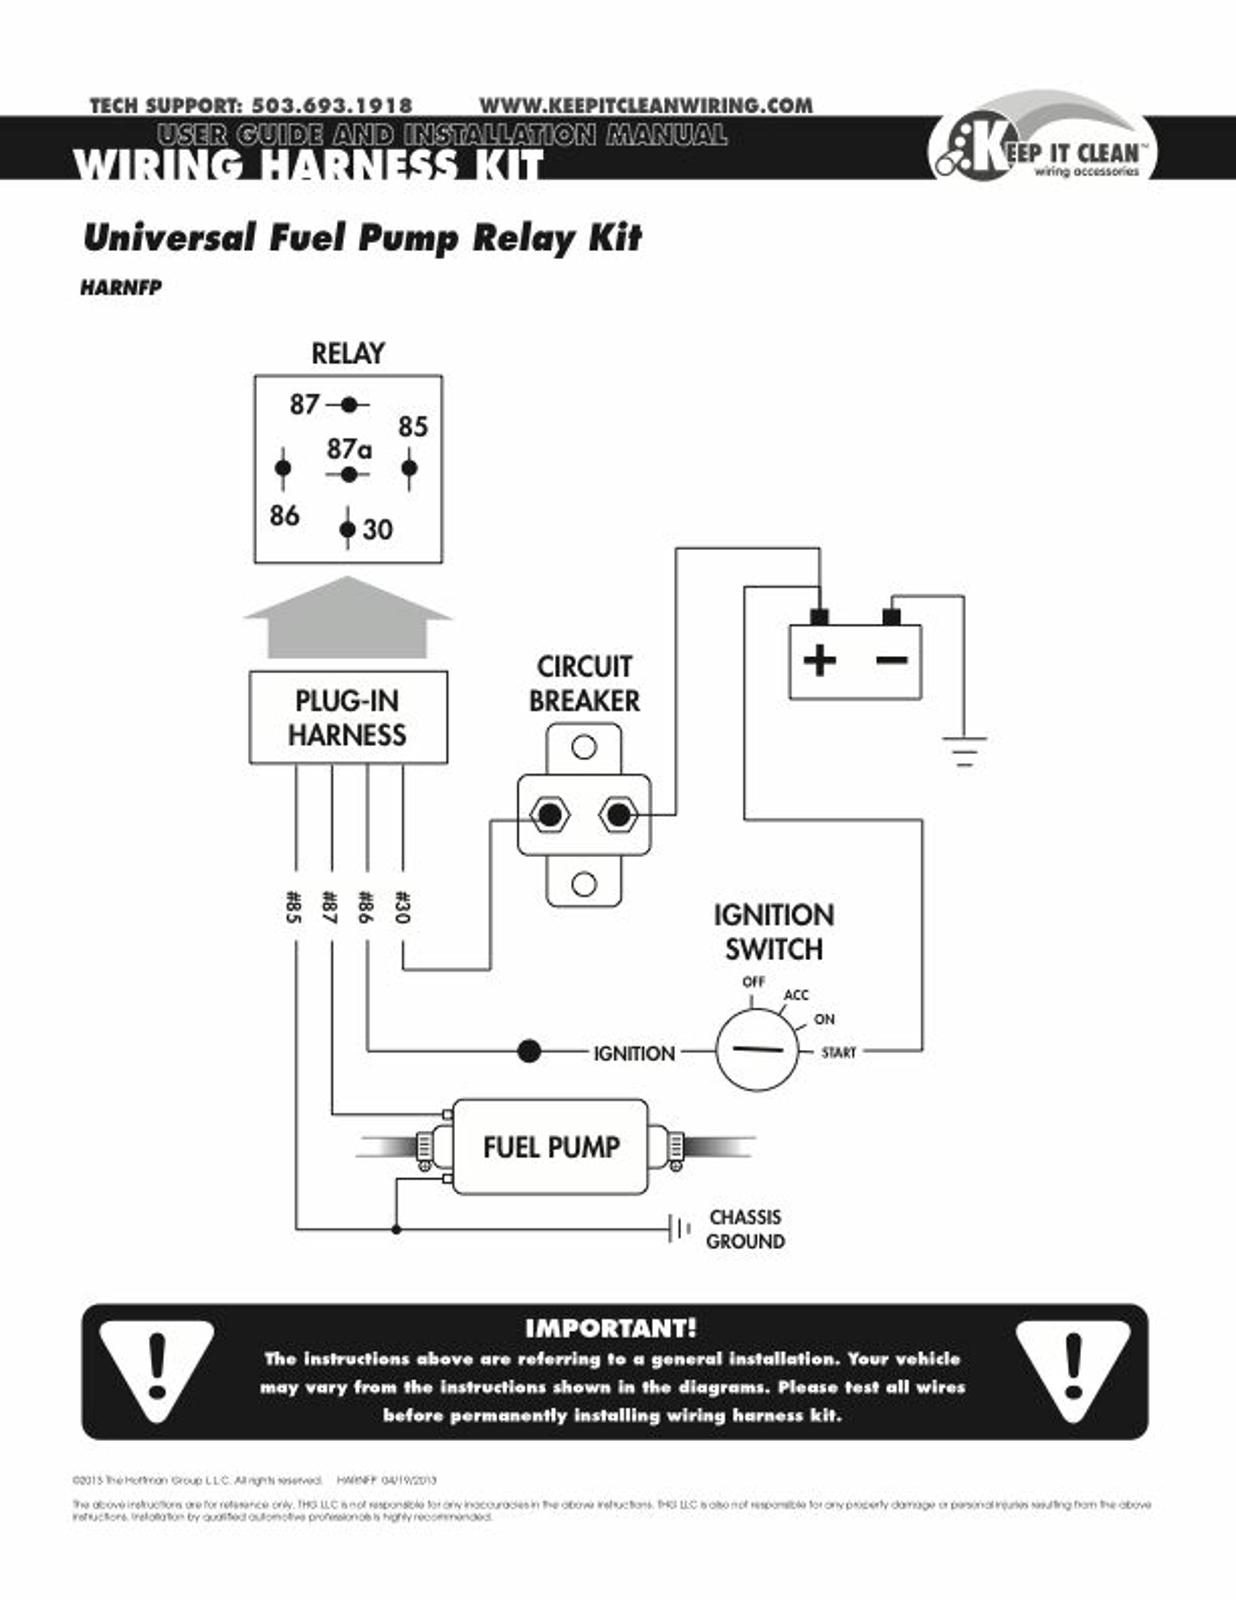 426 hemi chrysler v8 electric fuel relay wiring kit race car parts ebay